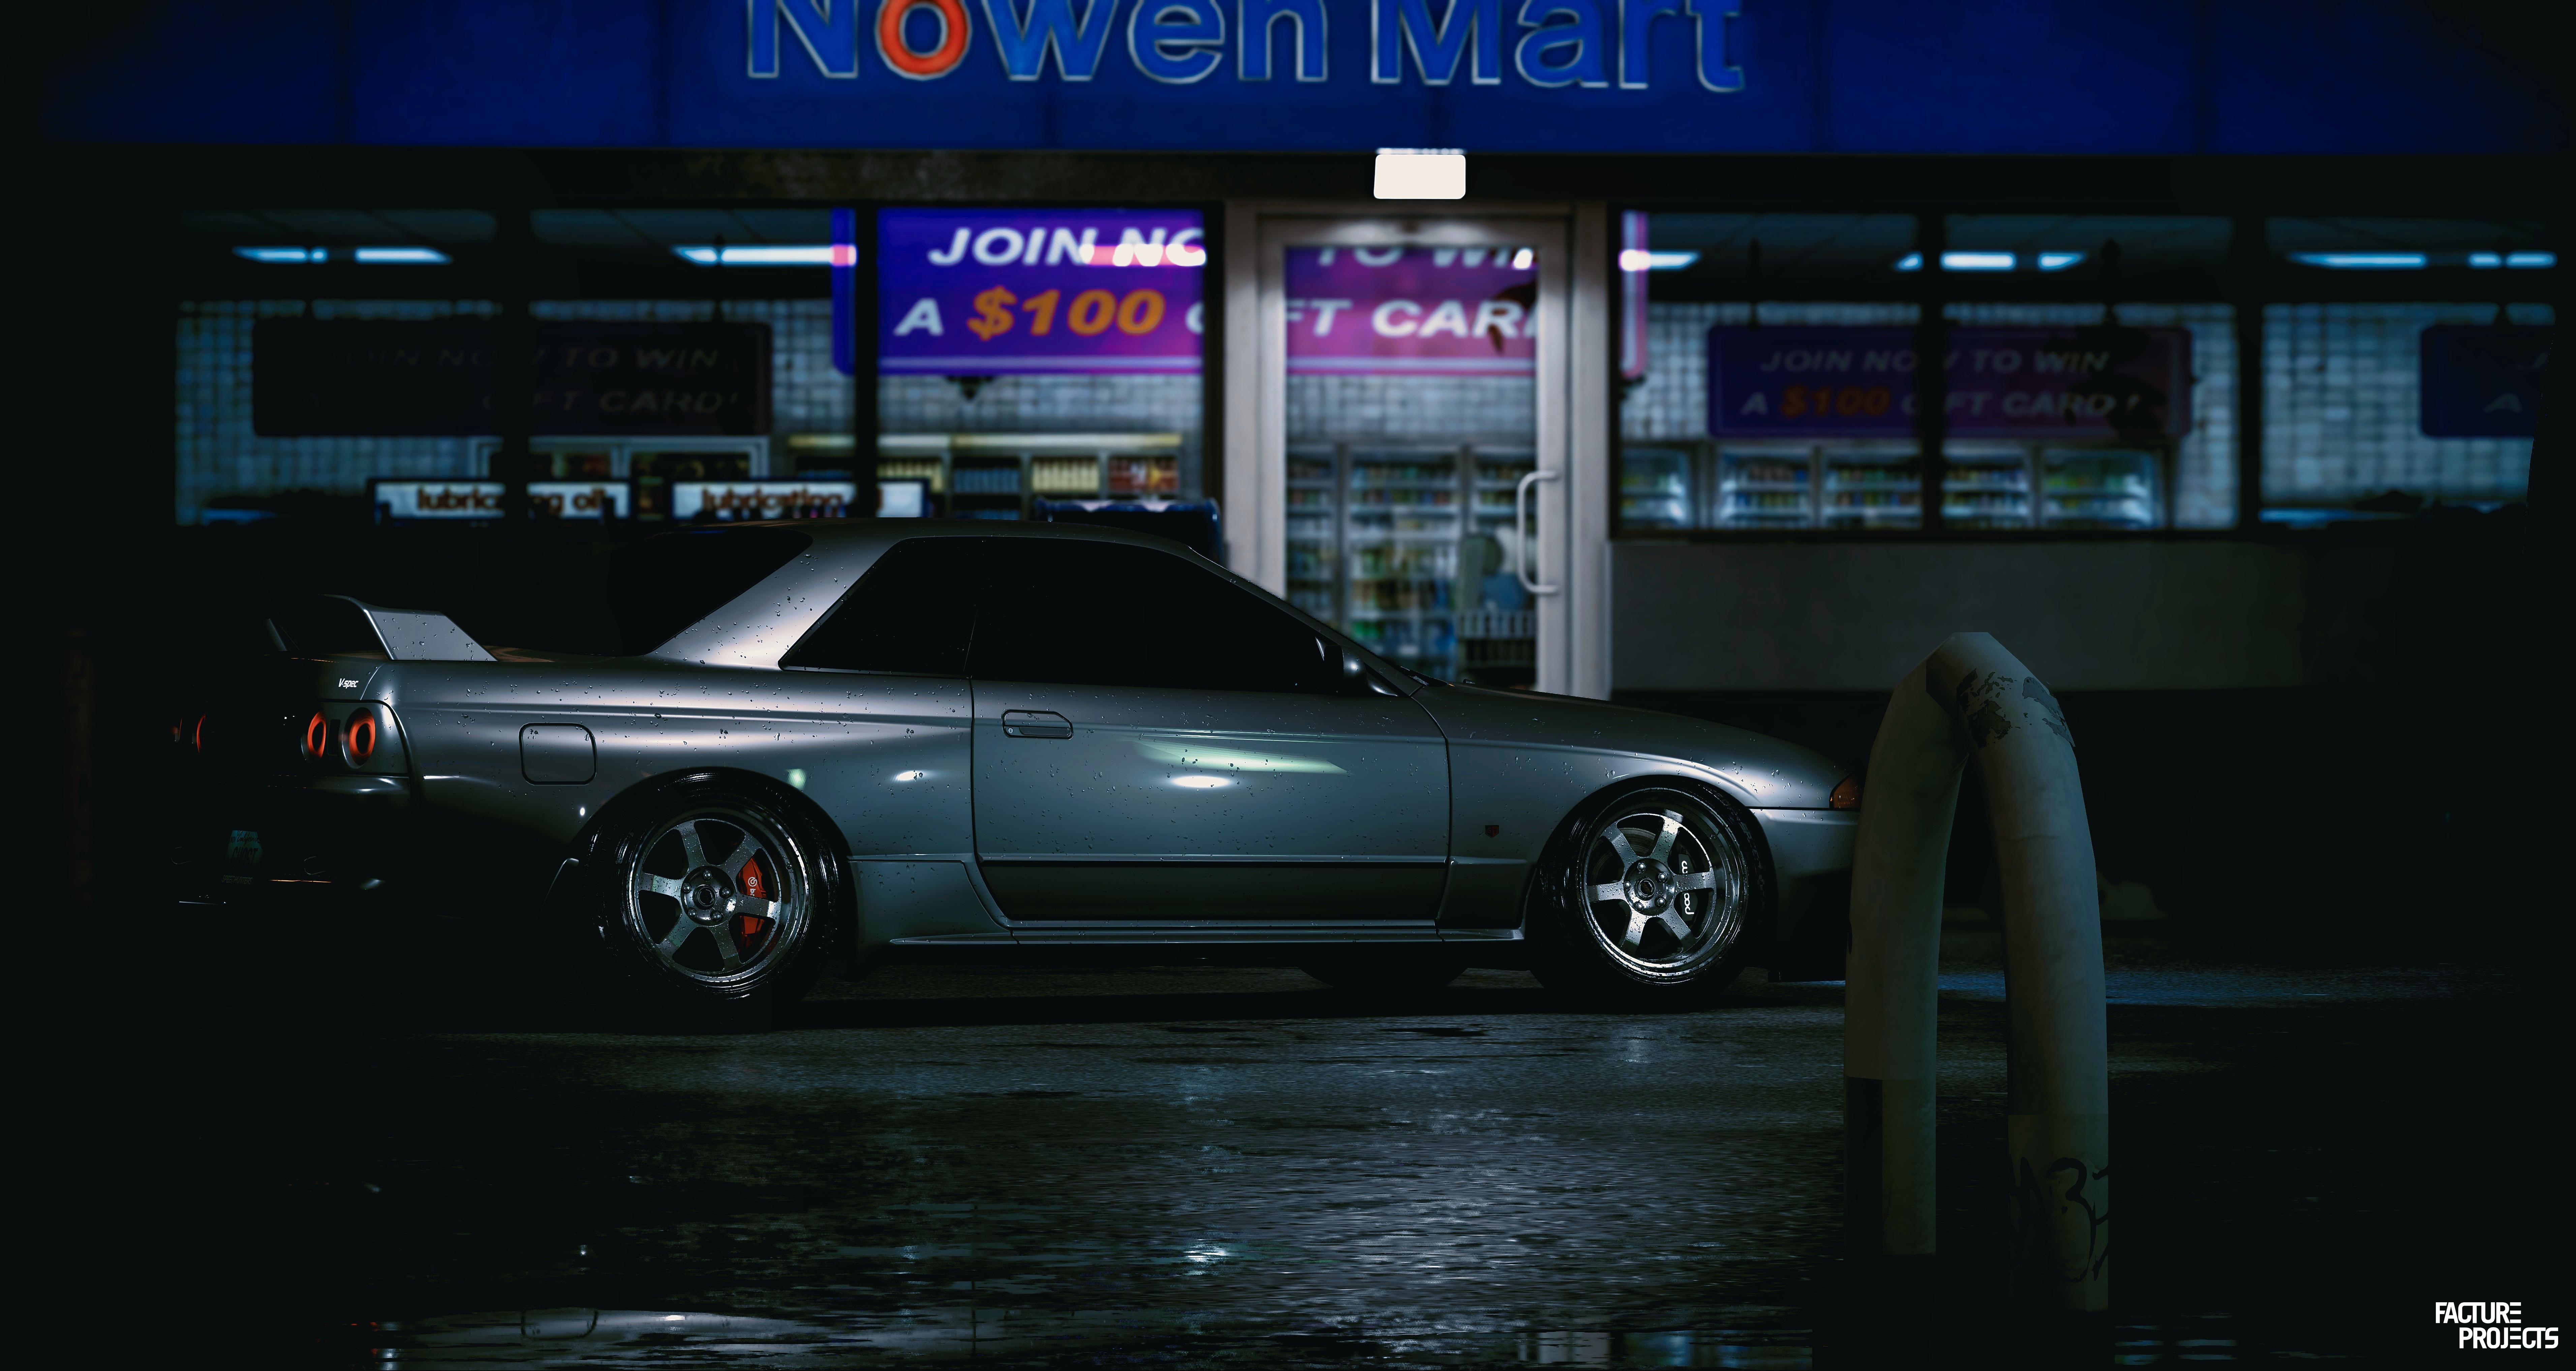 General 7644x4068 Nissan Skyline R32 NFS 2015 Need for Speed gray cars car billards Nissan GT-R Nissan GT-R 2017 screen shot